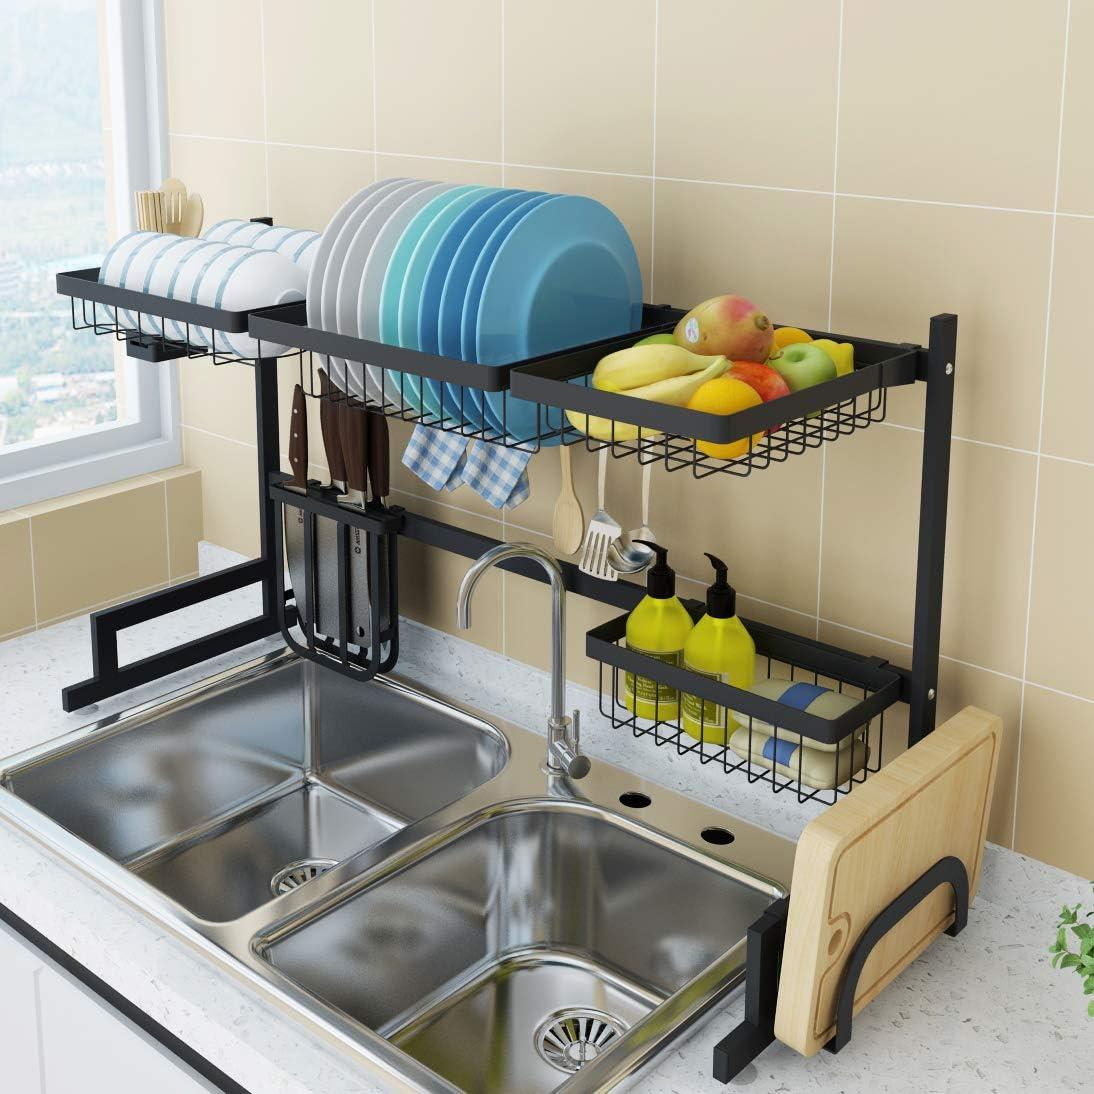 Amazon Com Dish Drying Rack Over Sink Drainer Shelf For Kitchen Drying Rack Organizer Supplies Storage Counter Kitchen Space Saver Utensils Holder Kitchen Dining